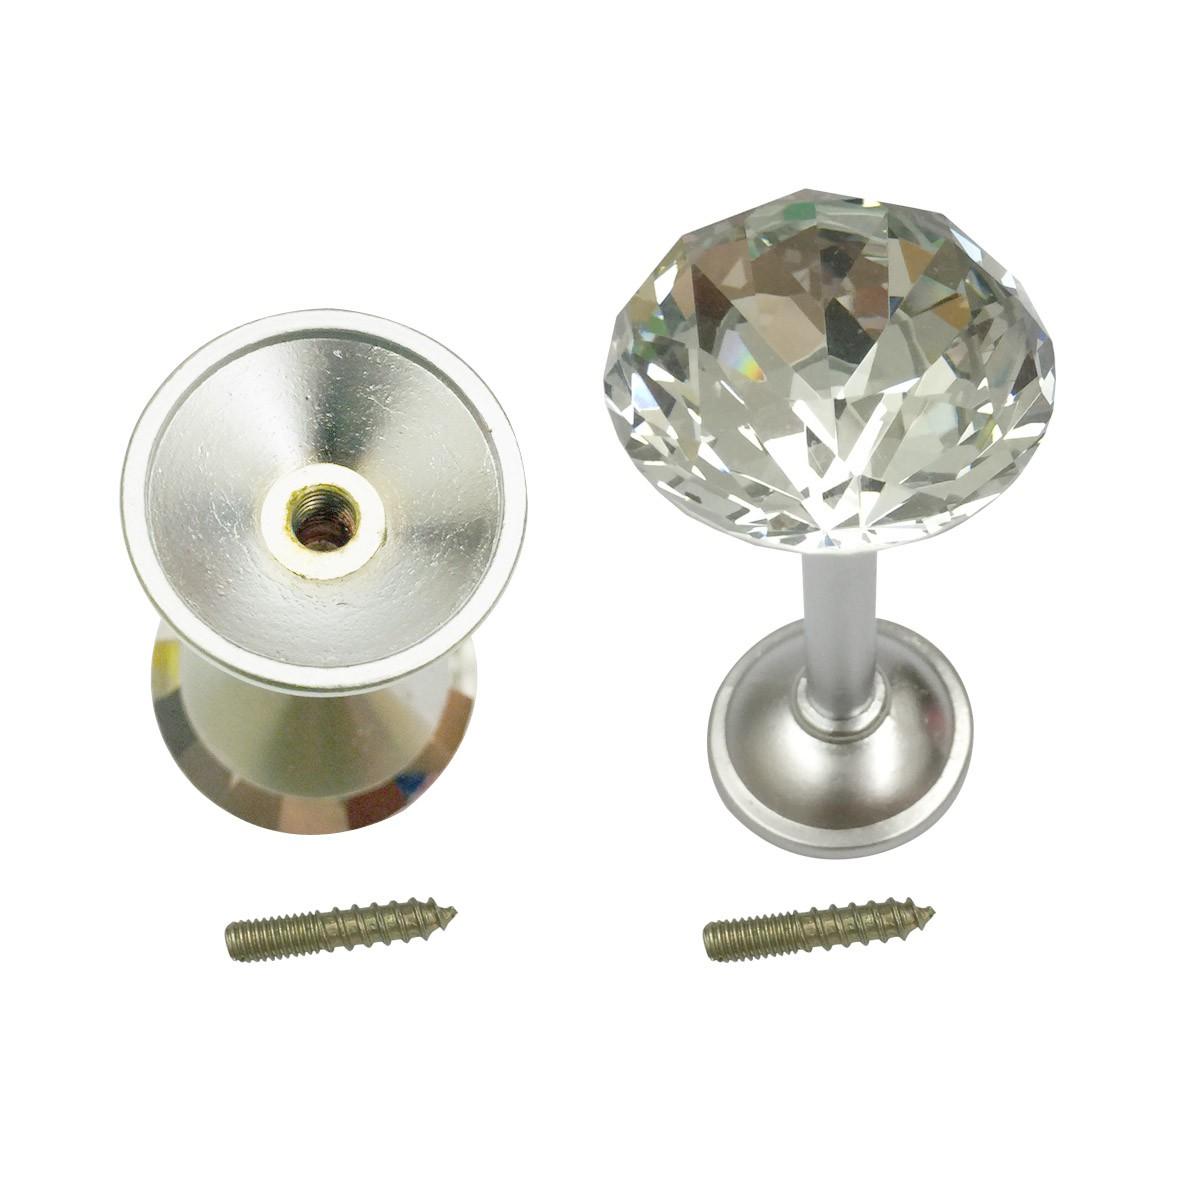 Glass Curtain Tieback Holders Satin Nickel